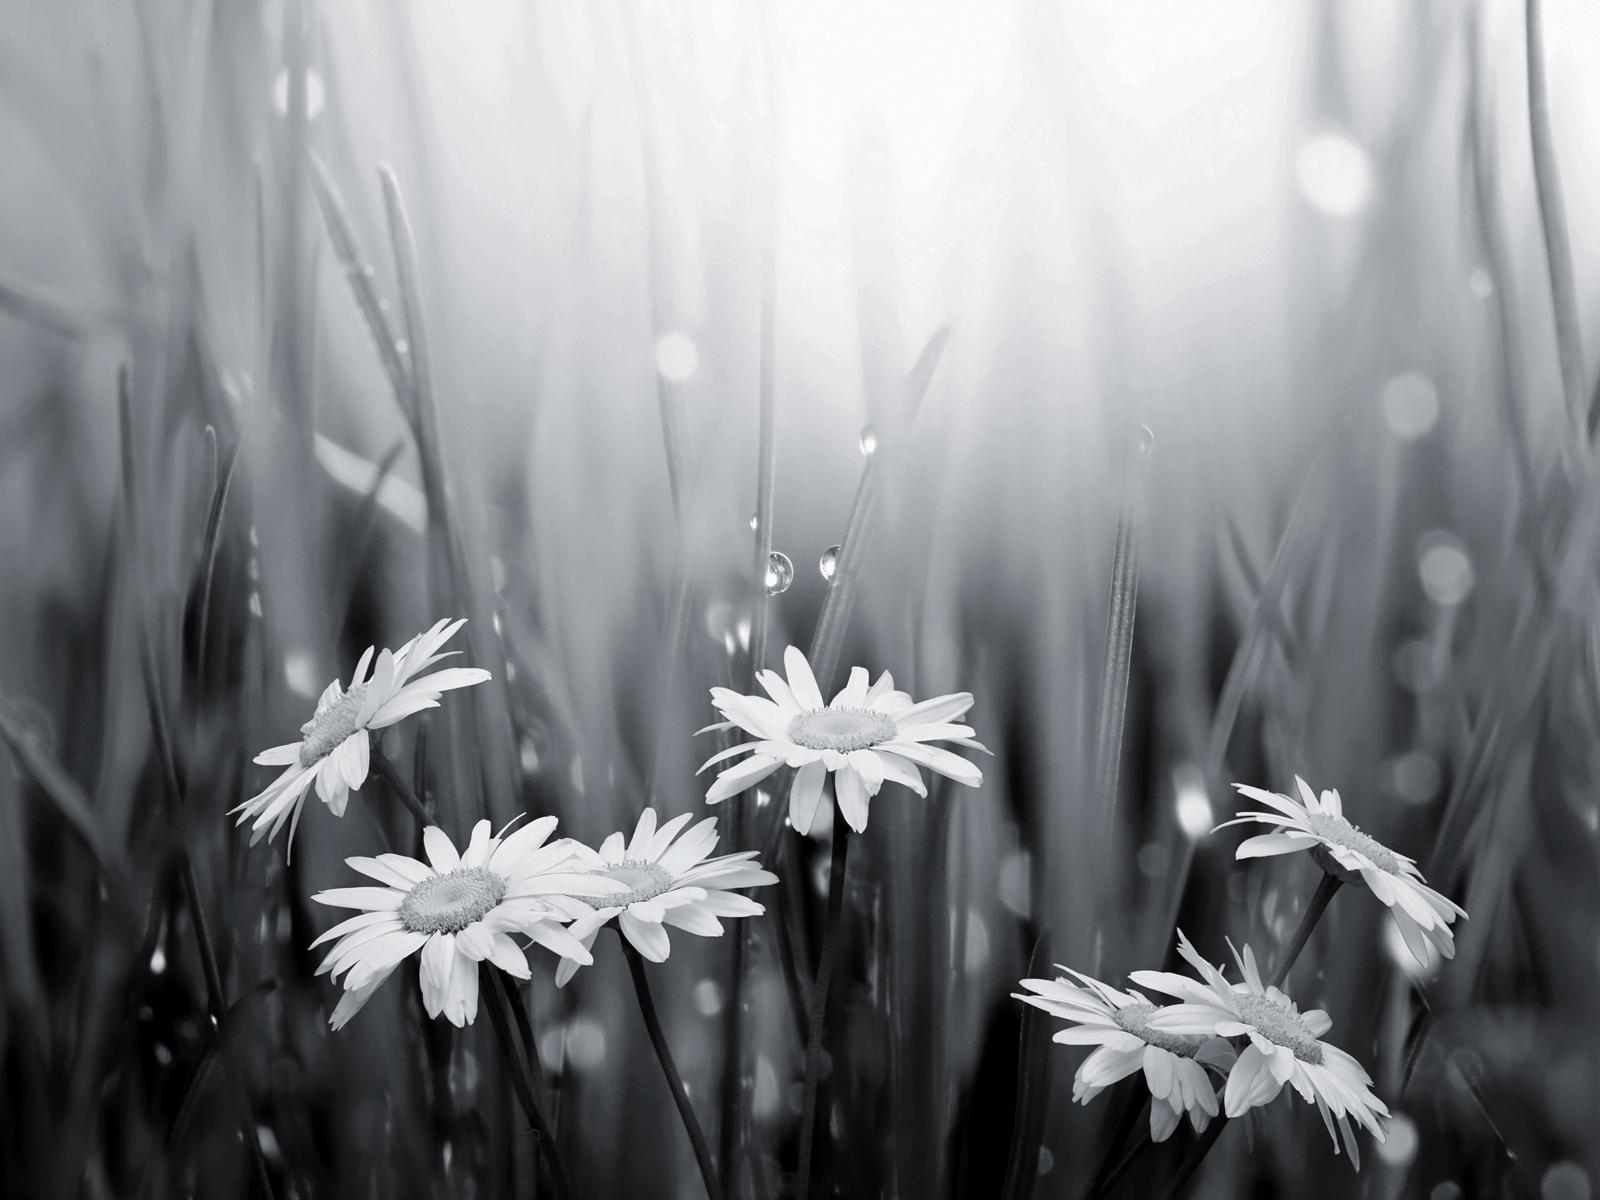 Raindrops Falling On Flowers Wallpaper Black And White Flowers Wallpapers Hd Pixelstalk Net